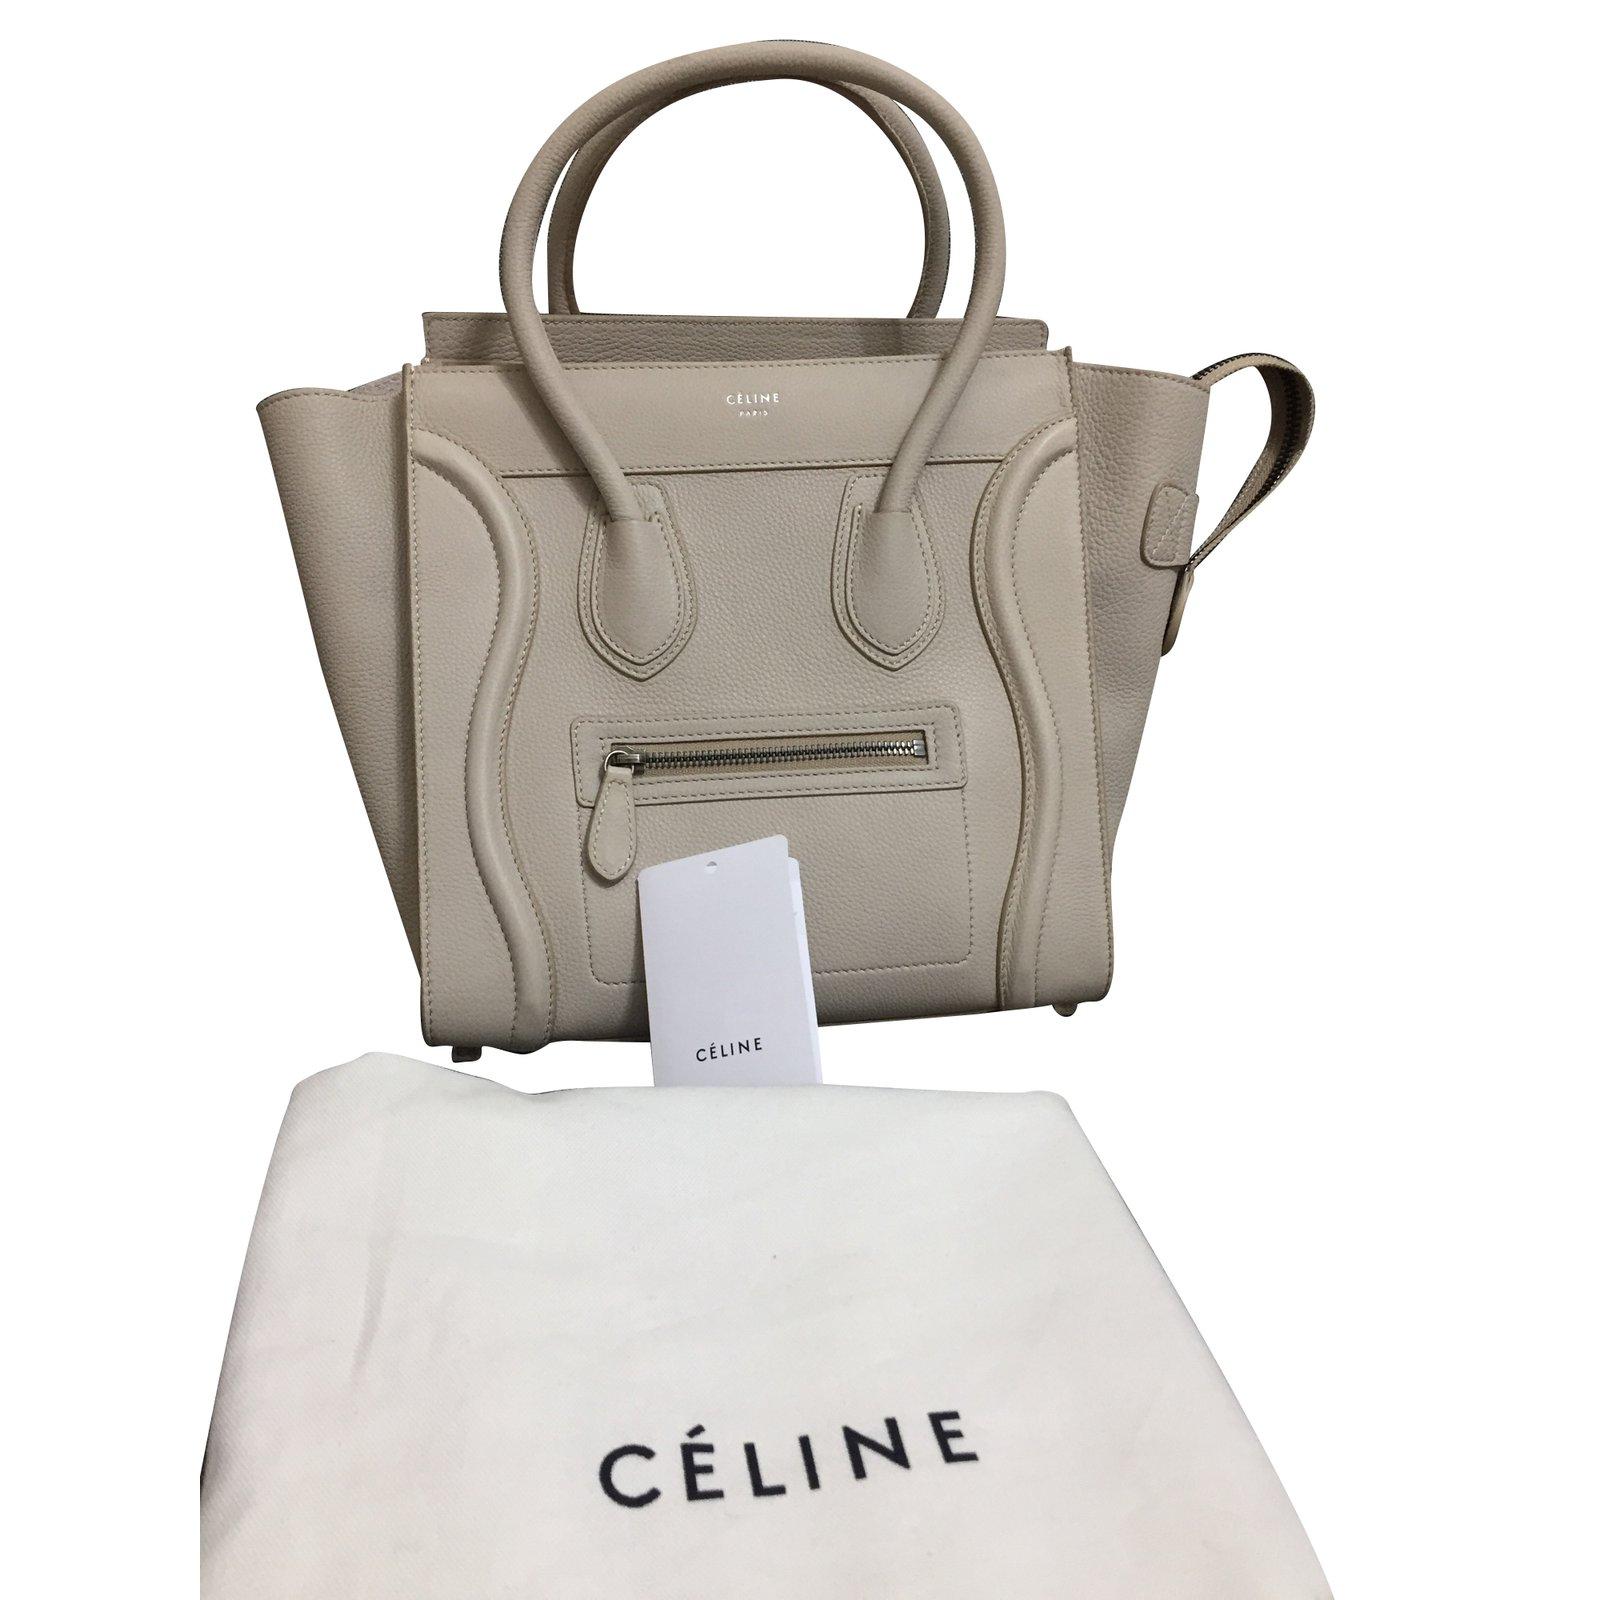 32c4ebdb1b4f Céline Handbag Handbags Leather Beige ref.85194 - Joli Closet